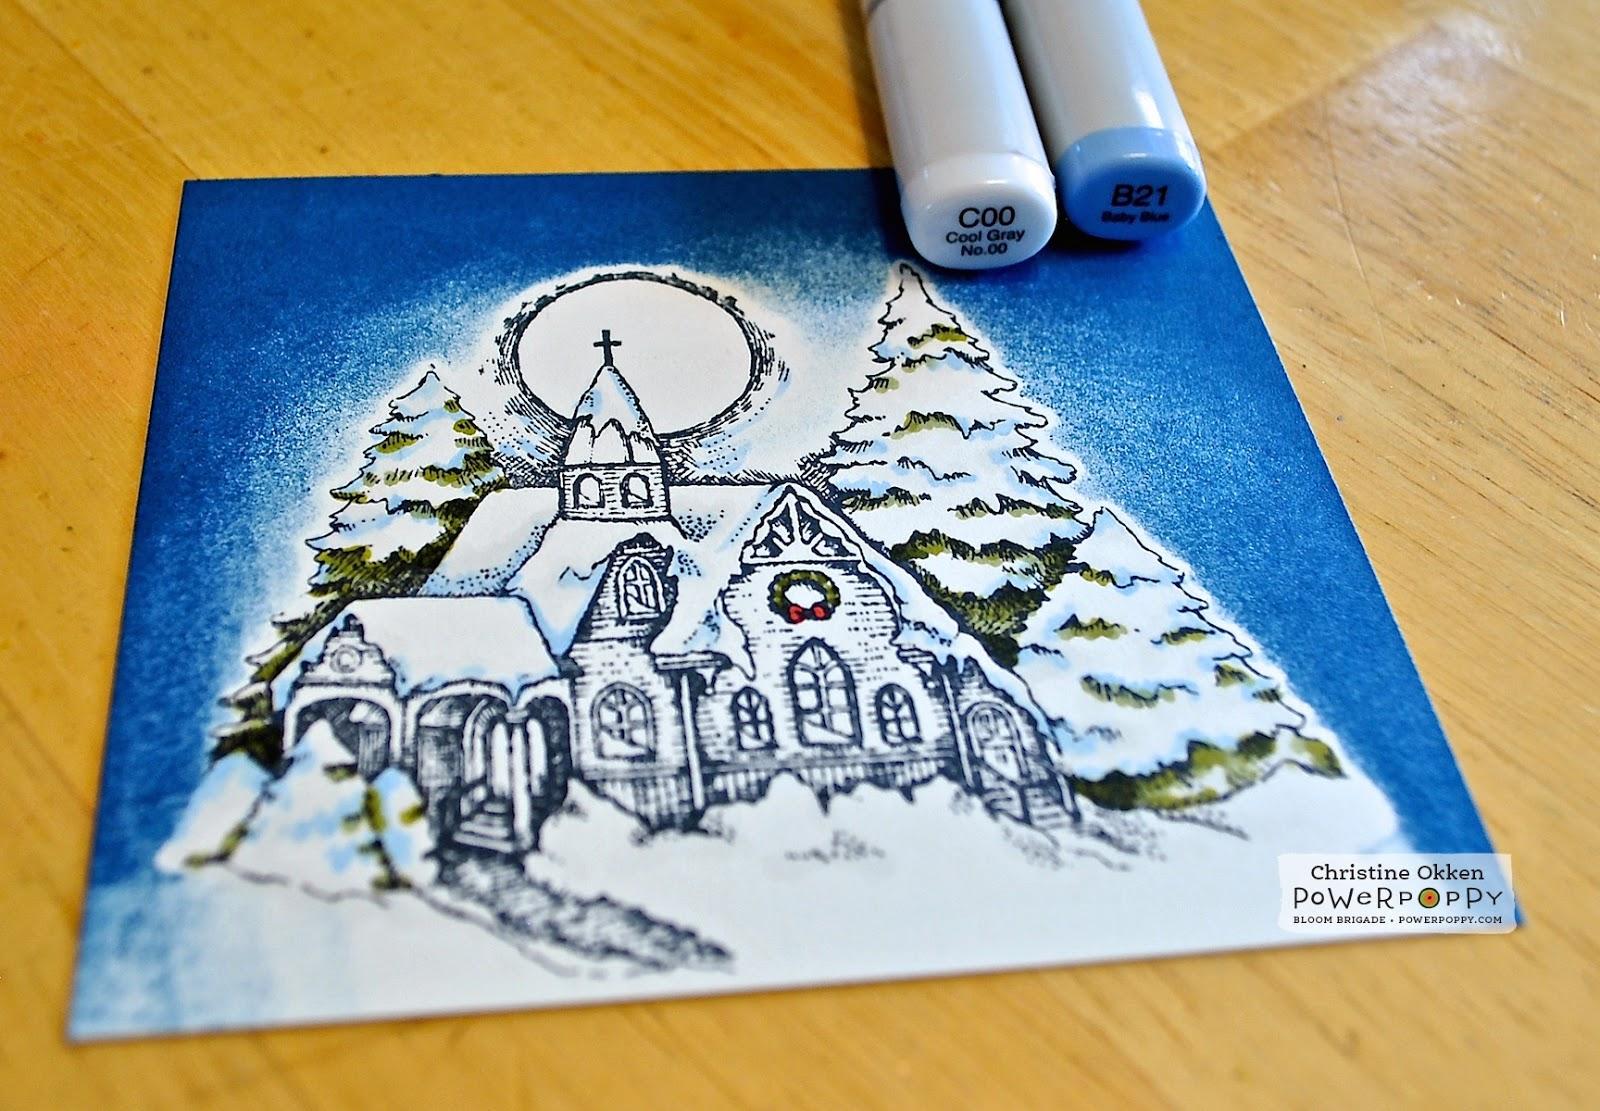 Power Poppy - The Blog: Colouring Moonlit Winter Snow